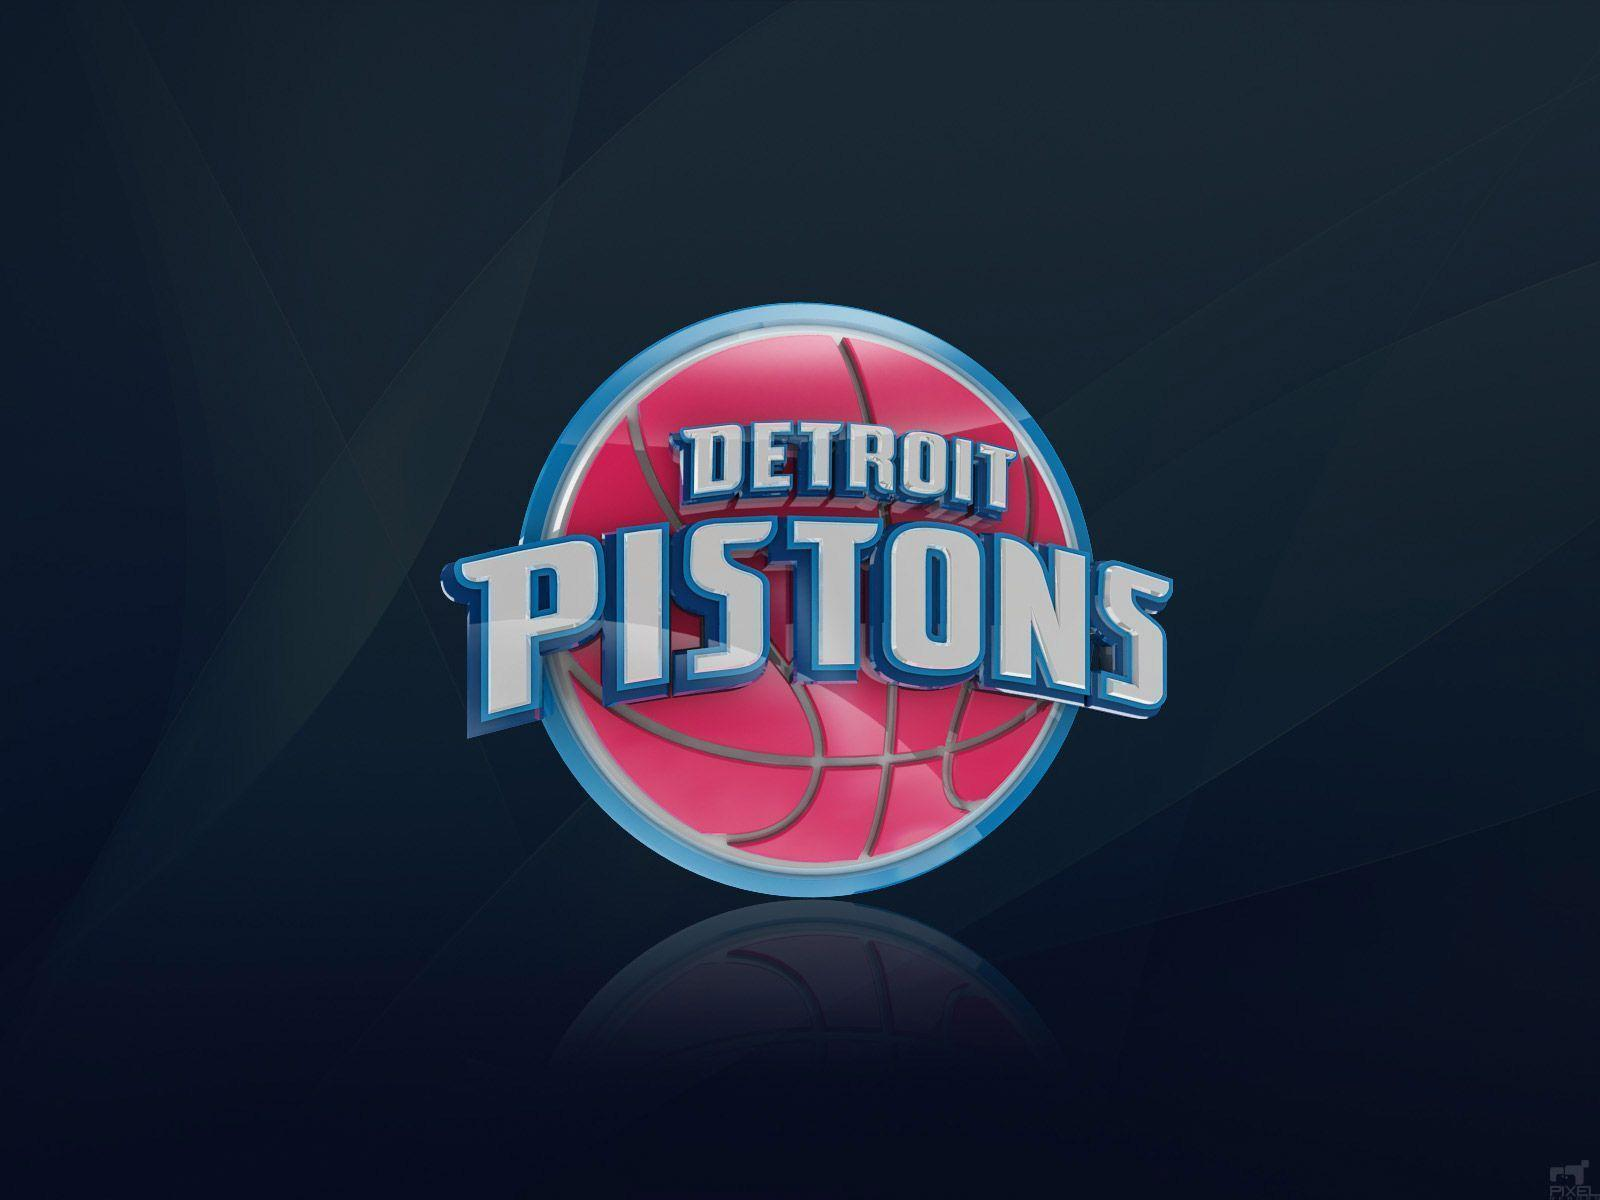 Detroit Pistons Wallpapers - Wallpaper Cave